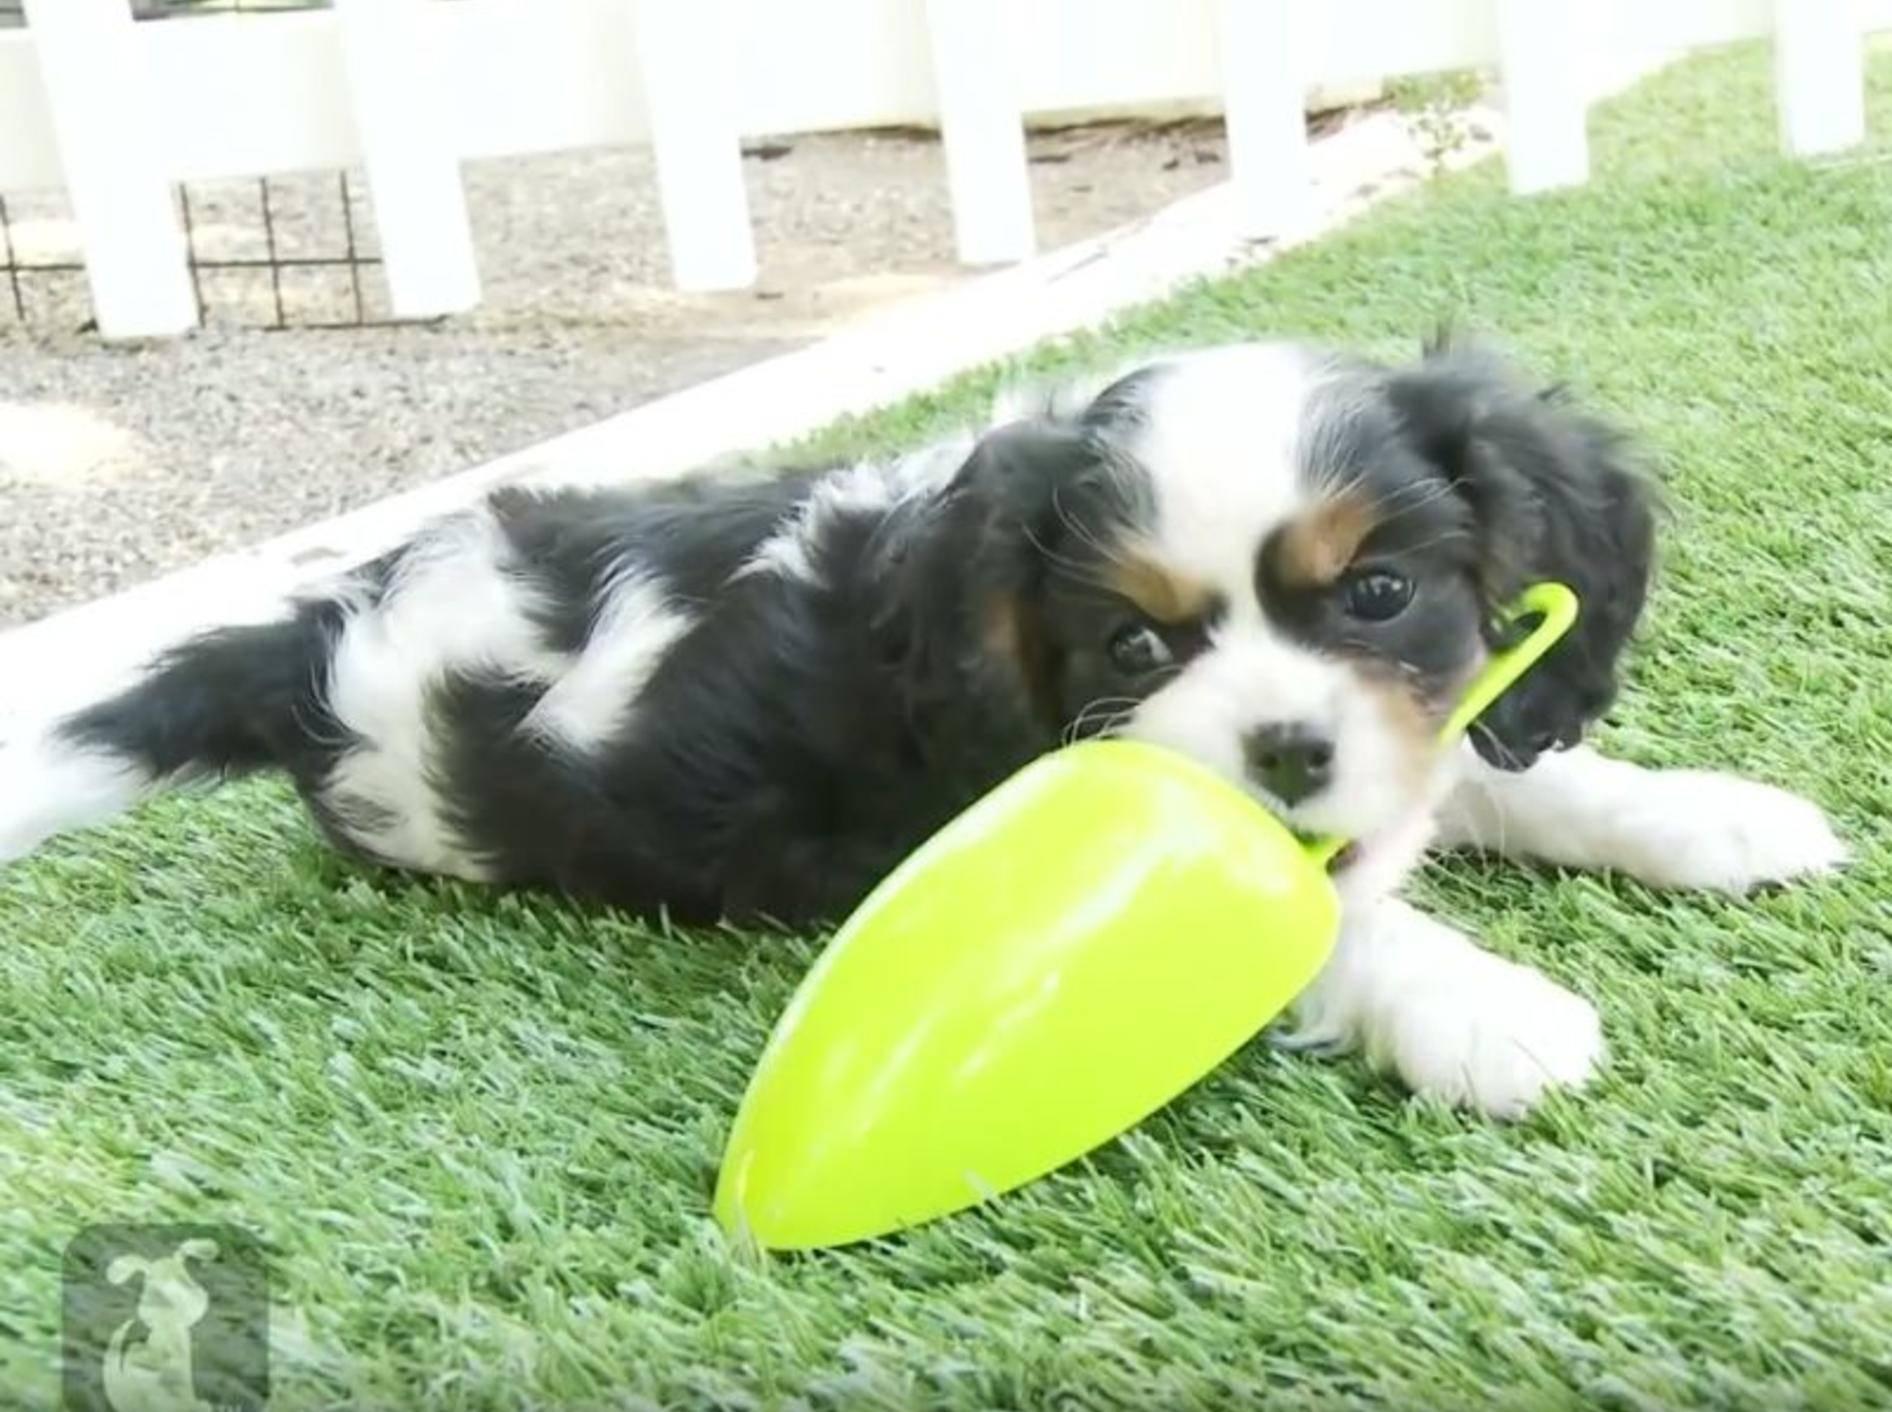 Tapsige Cavalier King Charles Spaniel Welpen beim Spielen – YouTube / The Pet Collective